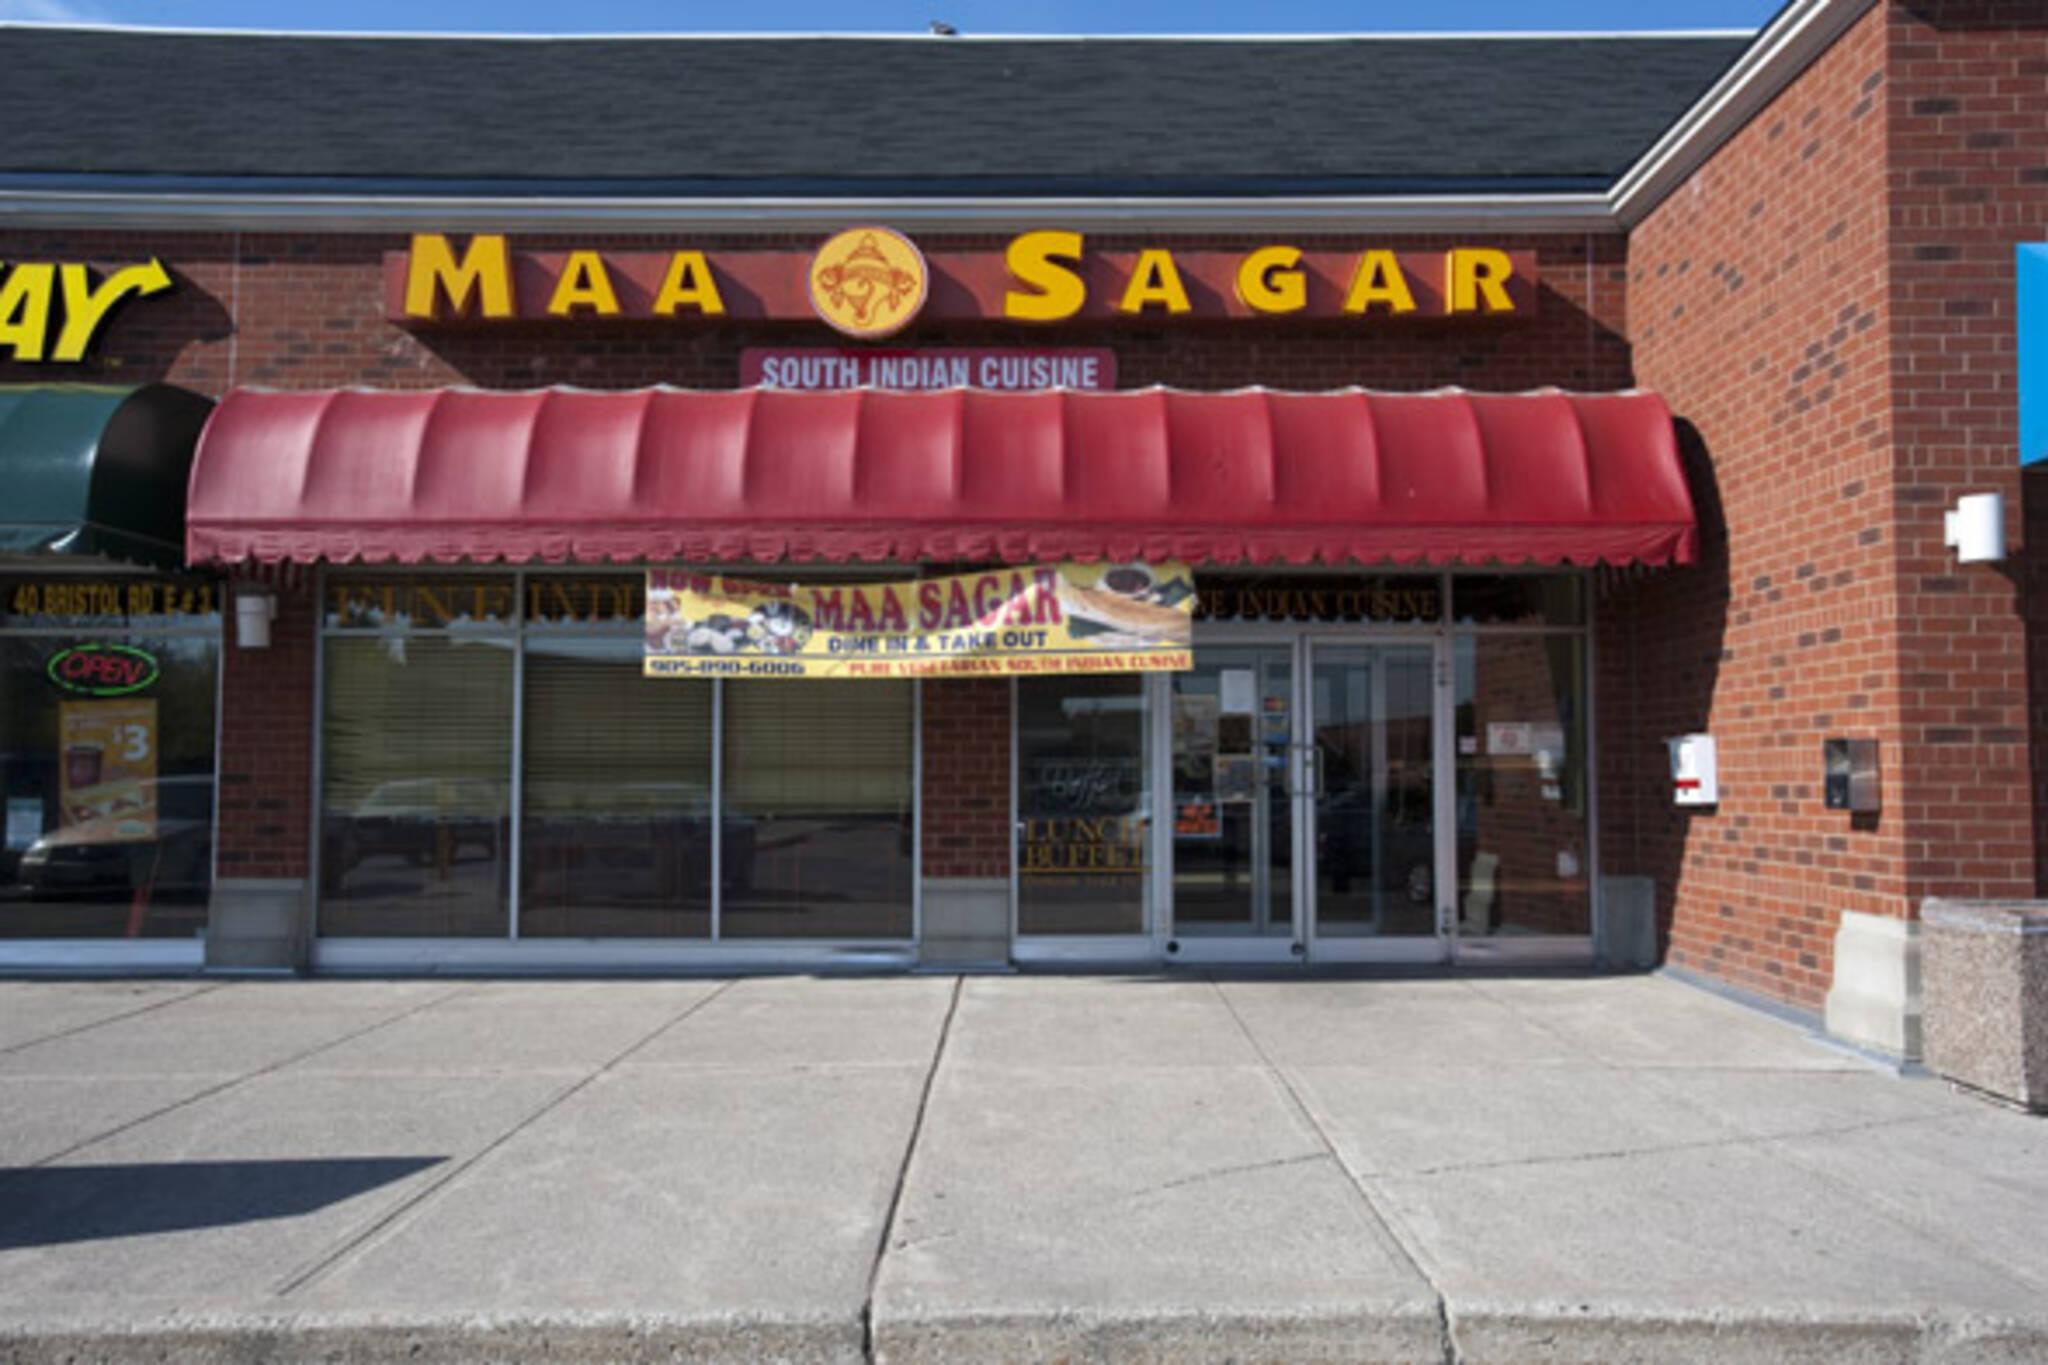 Maa sagar blogto toronto for Agra fine indian cuisine reviews